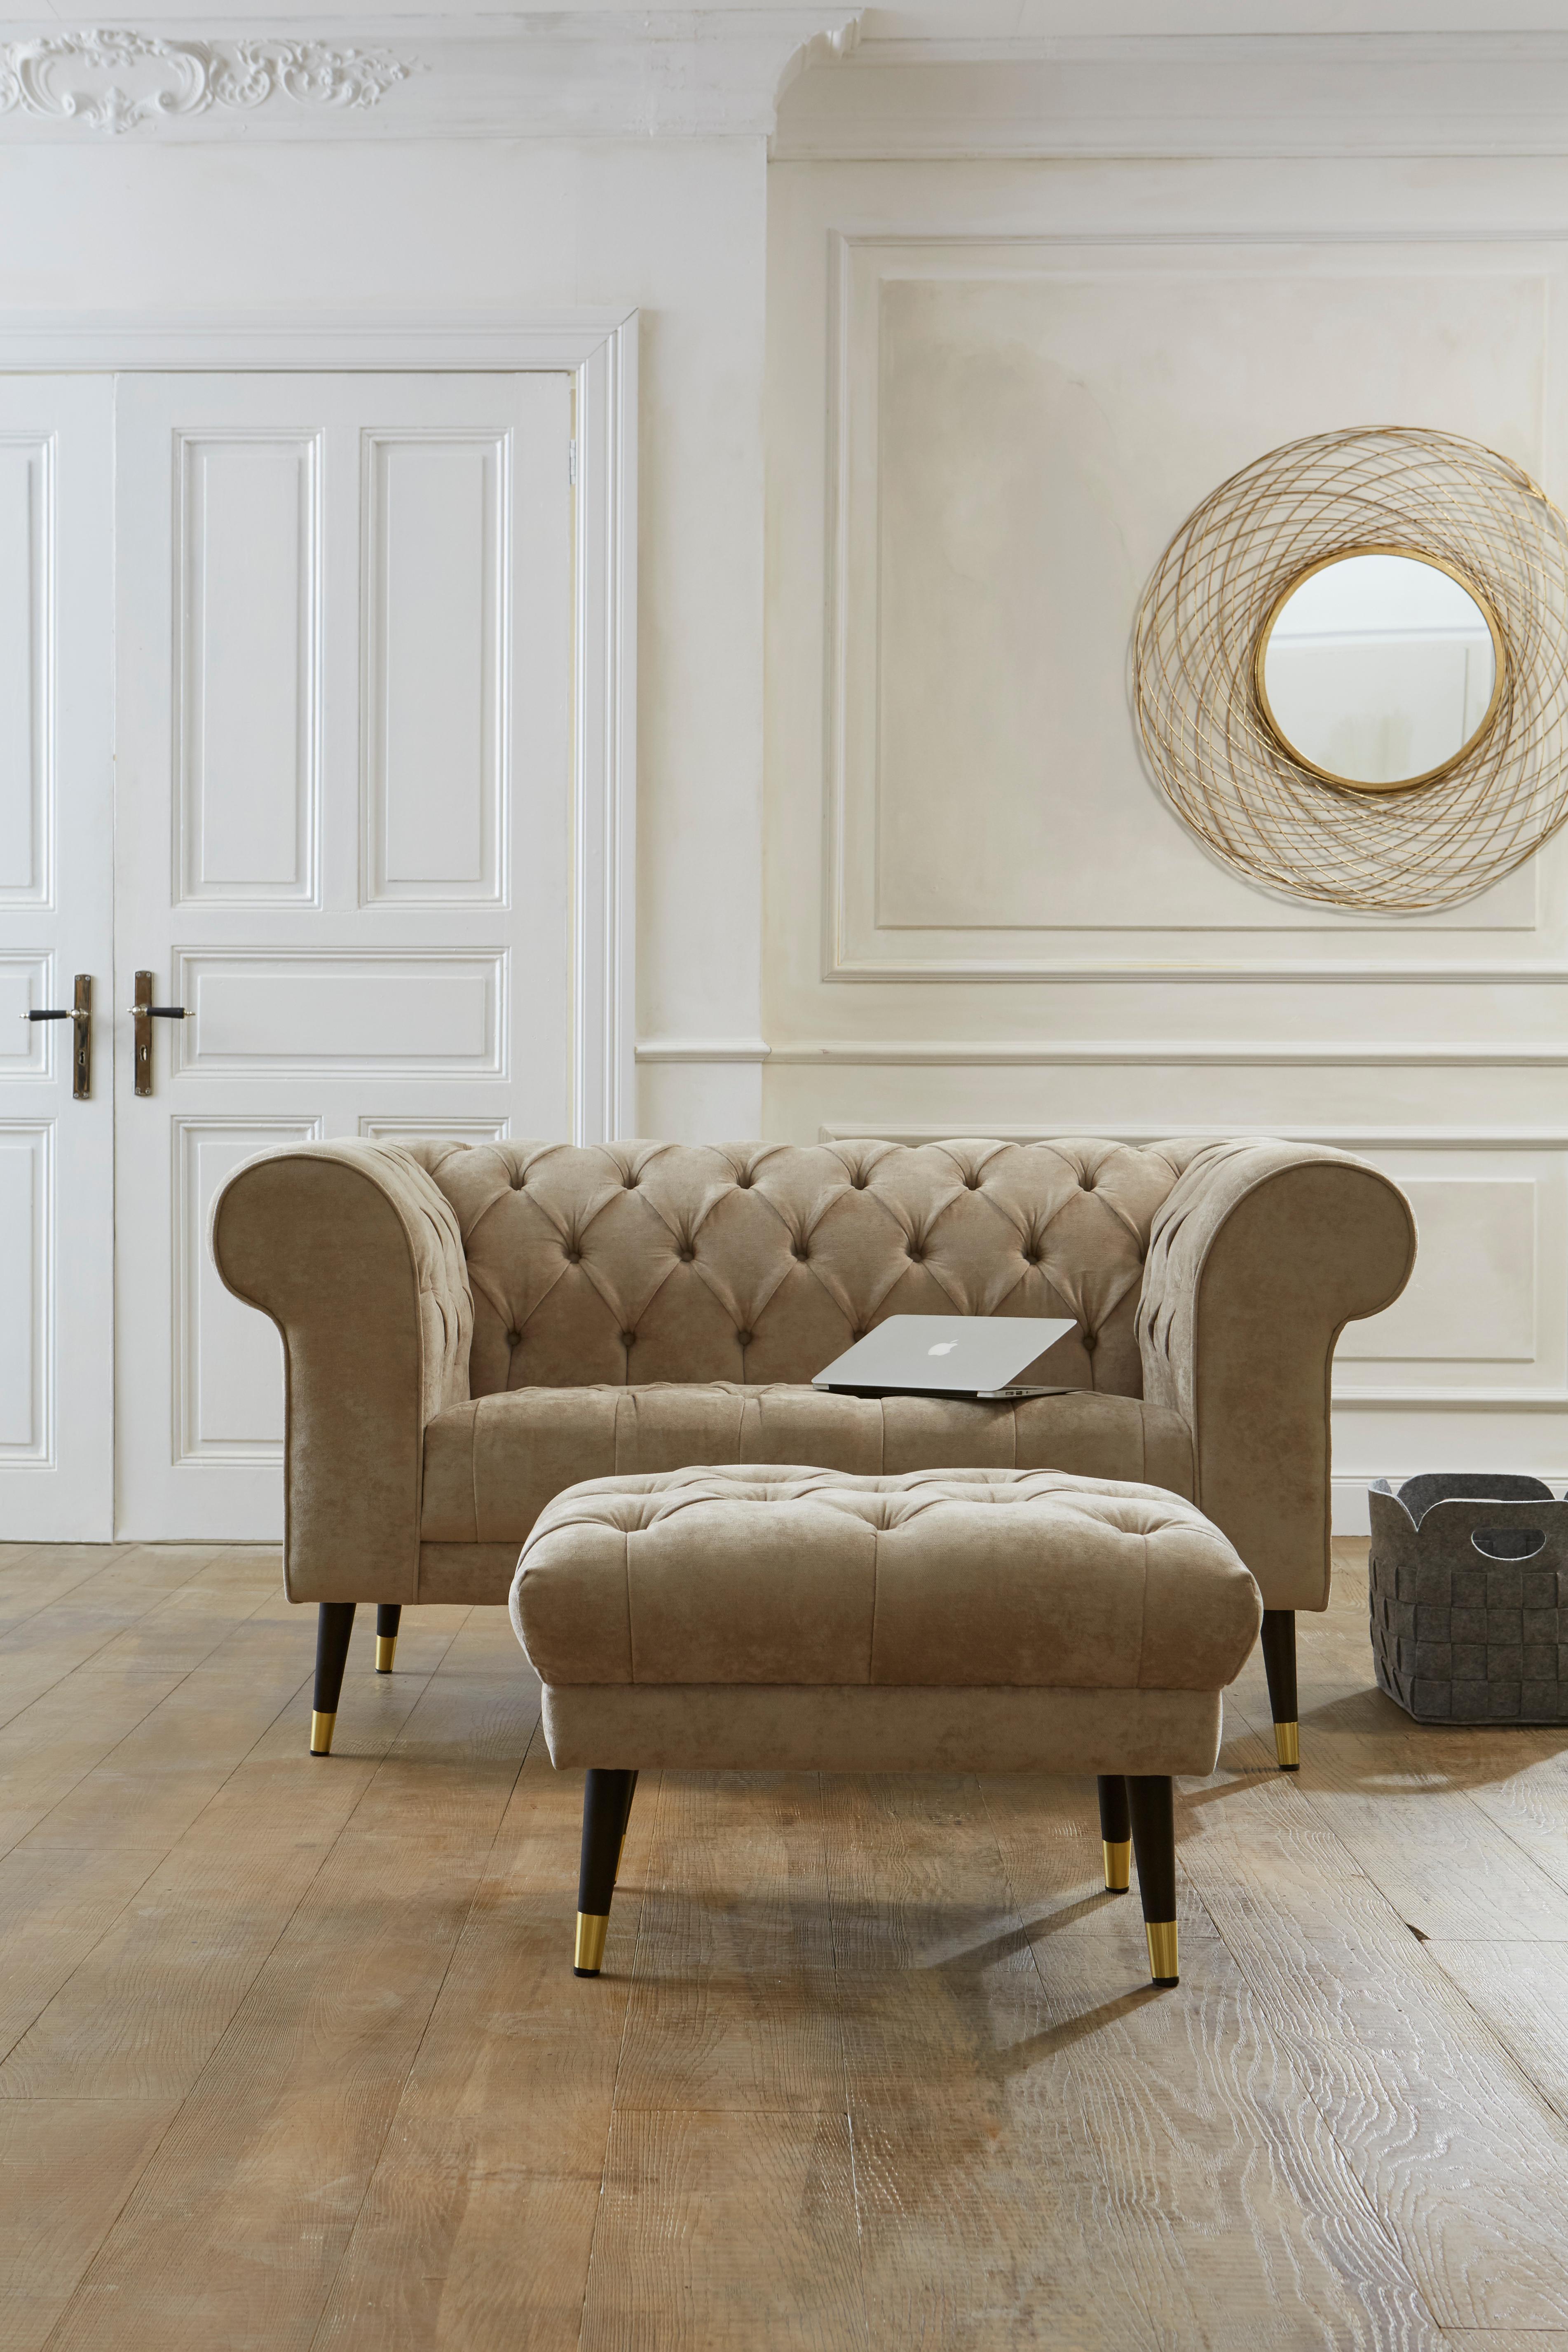 Guido Maria Kretschmer Home&Living Chesterfield-Sofa Tinnum günstig online kaufen